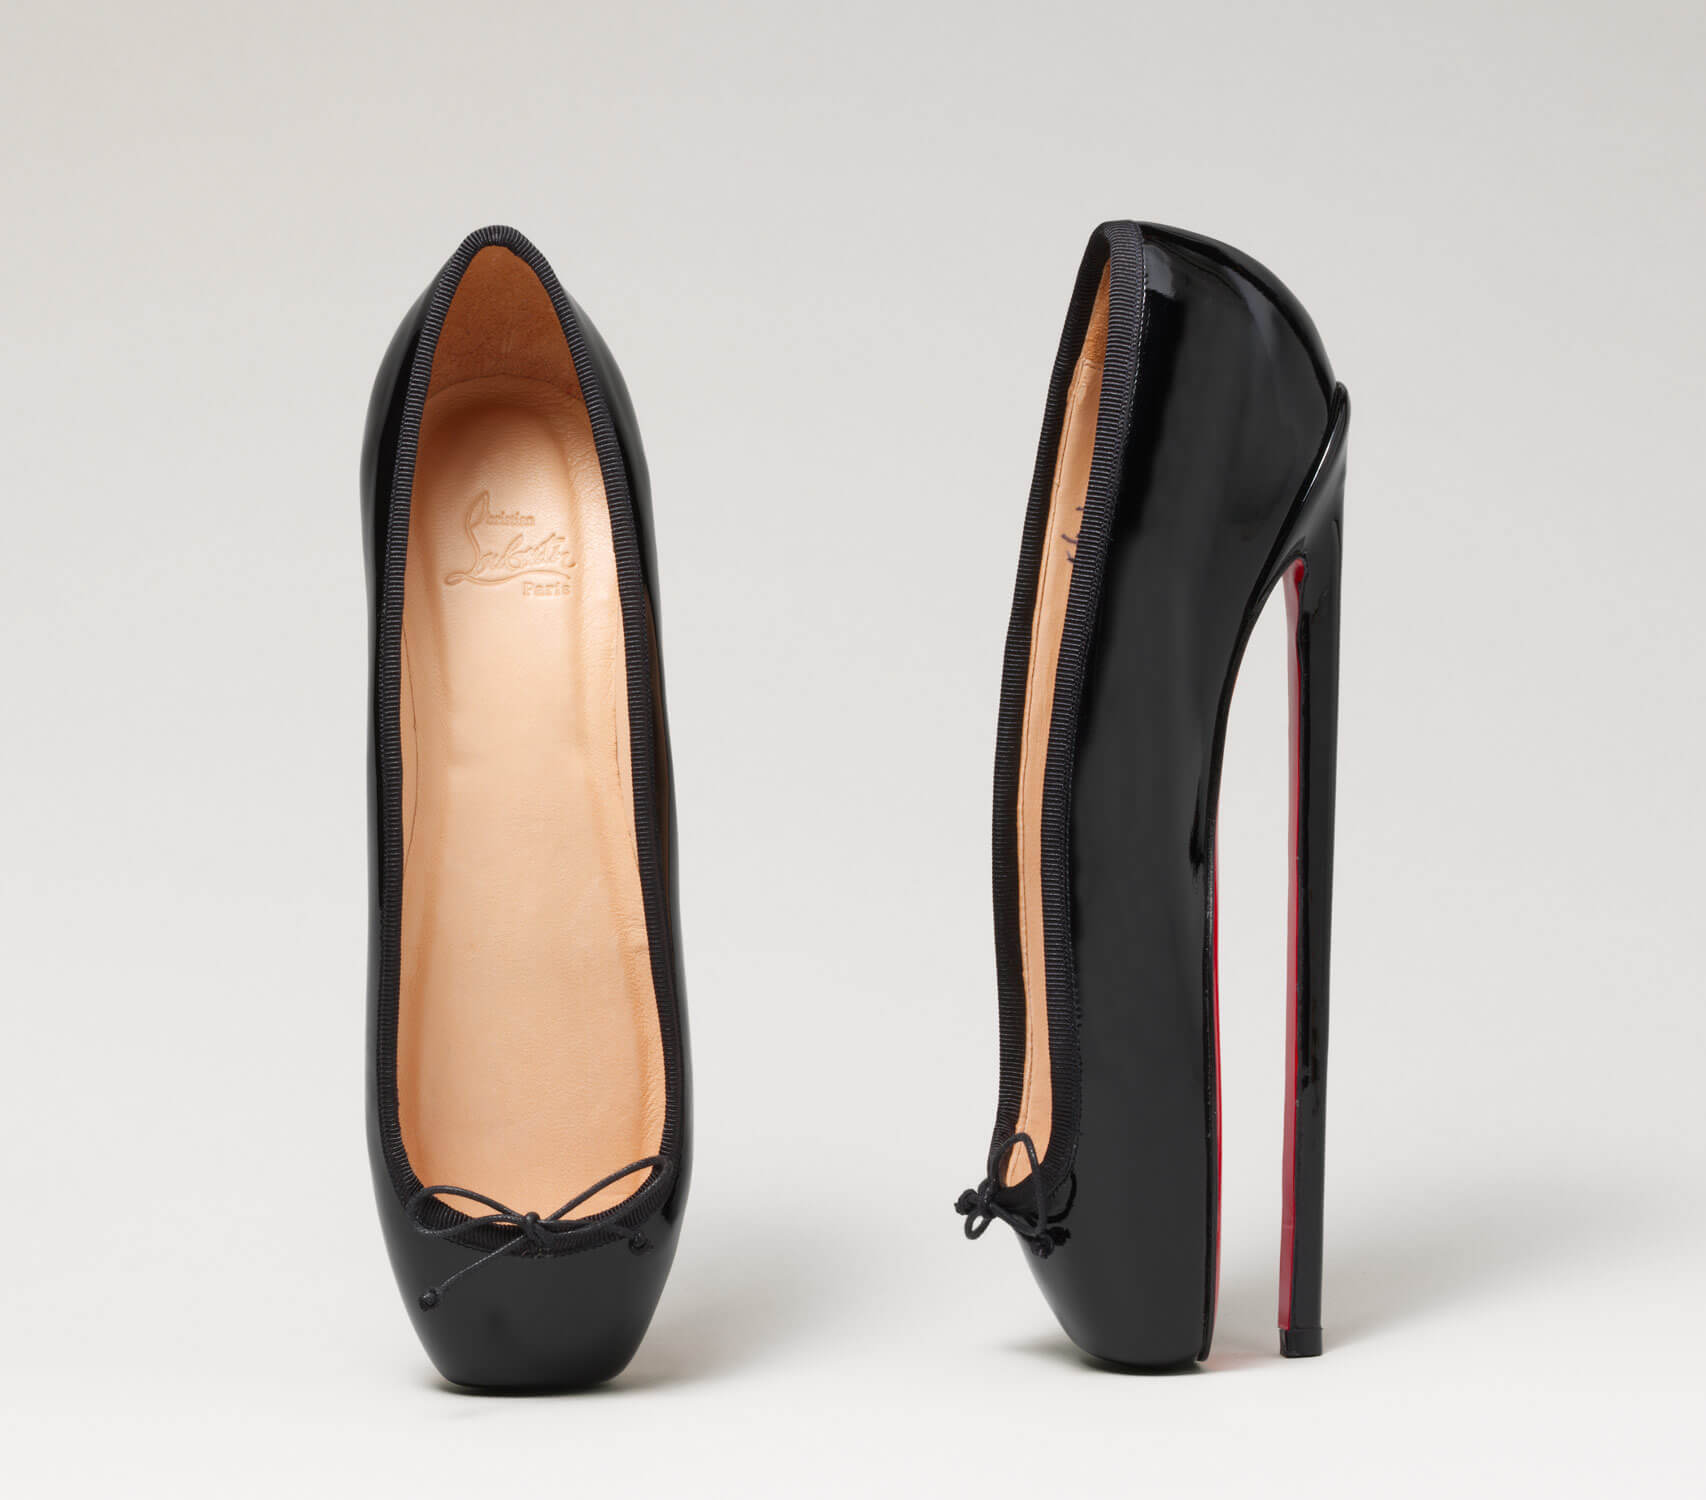 "Christian Louboutin在二〇〇七年設計了一雙名為""En Pointe""的高跟鞋,模仿芭蕾舞者跳腳尖舞步時的狀態。"